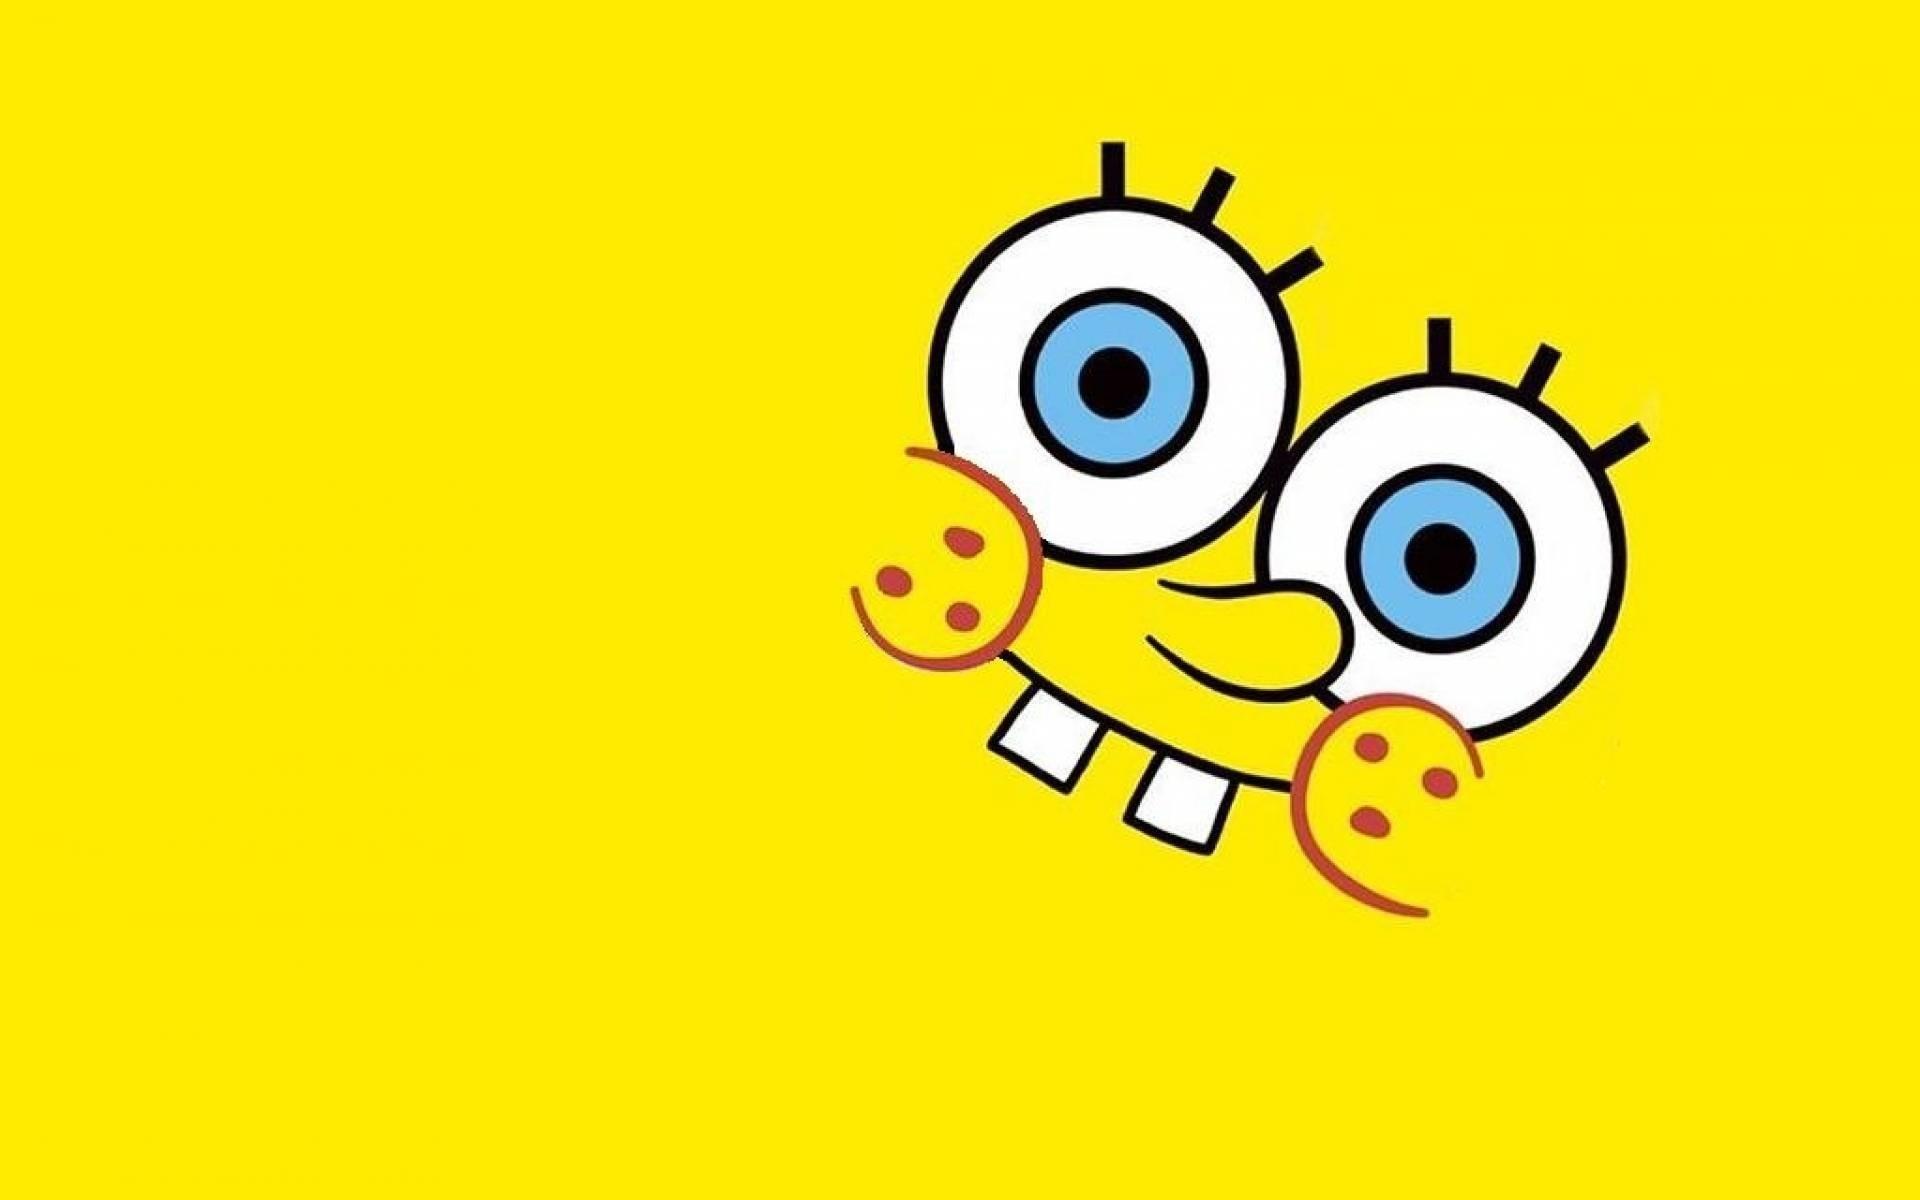 Spongebob Flower Sky Background